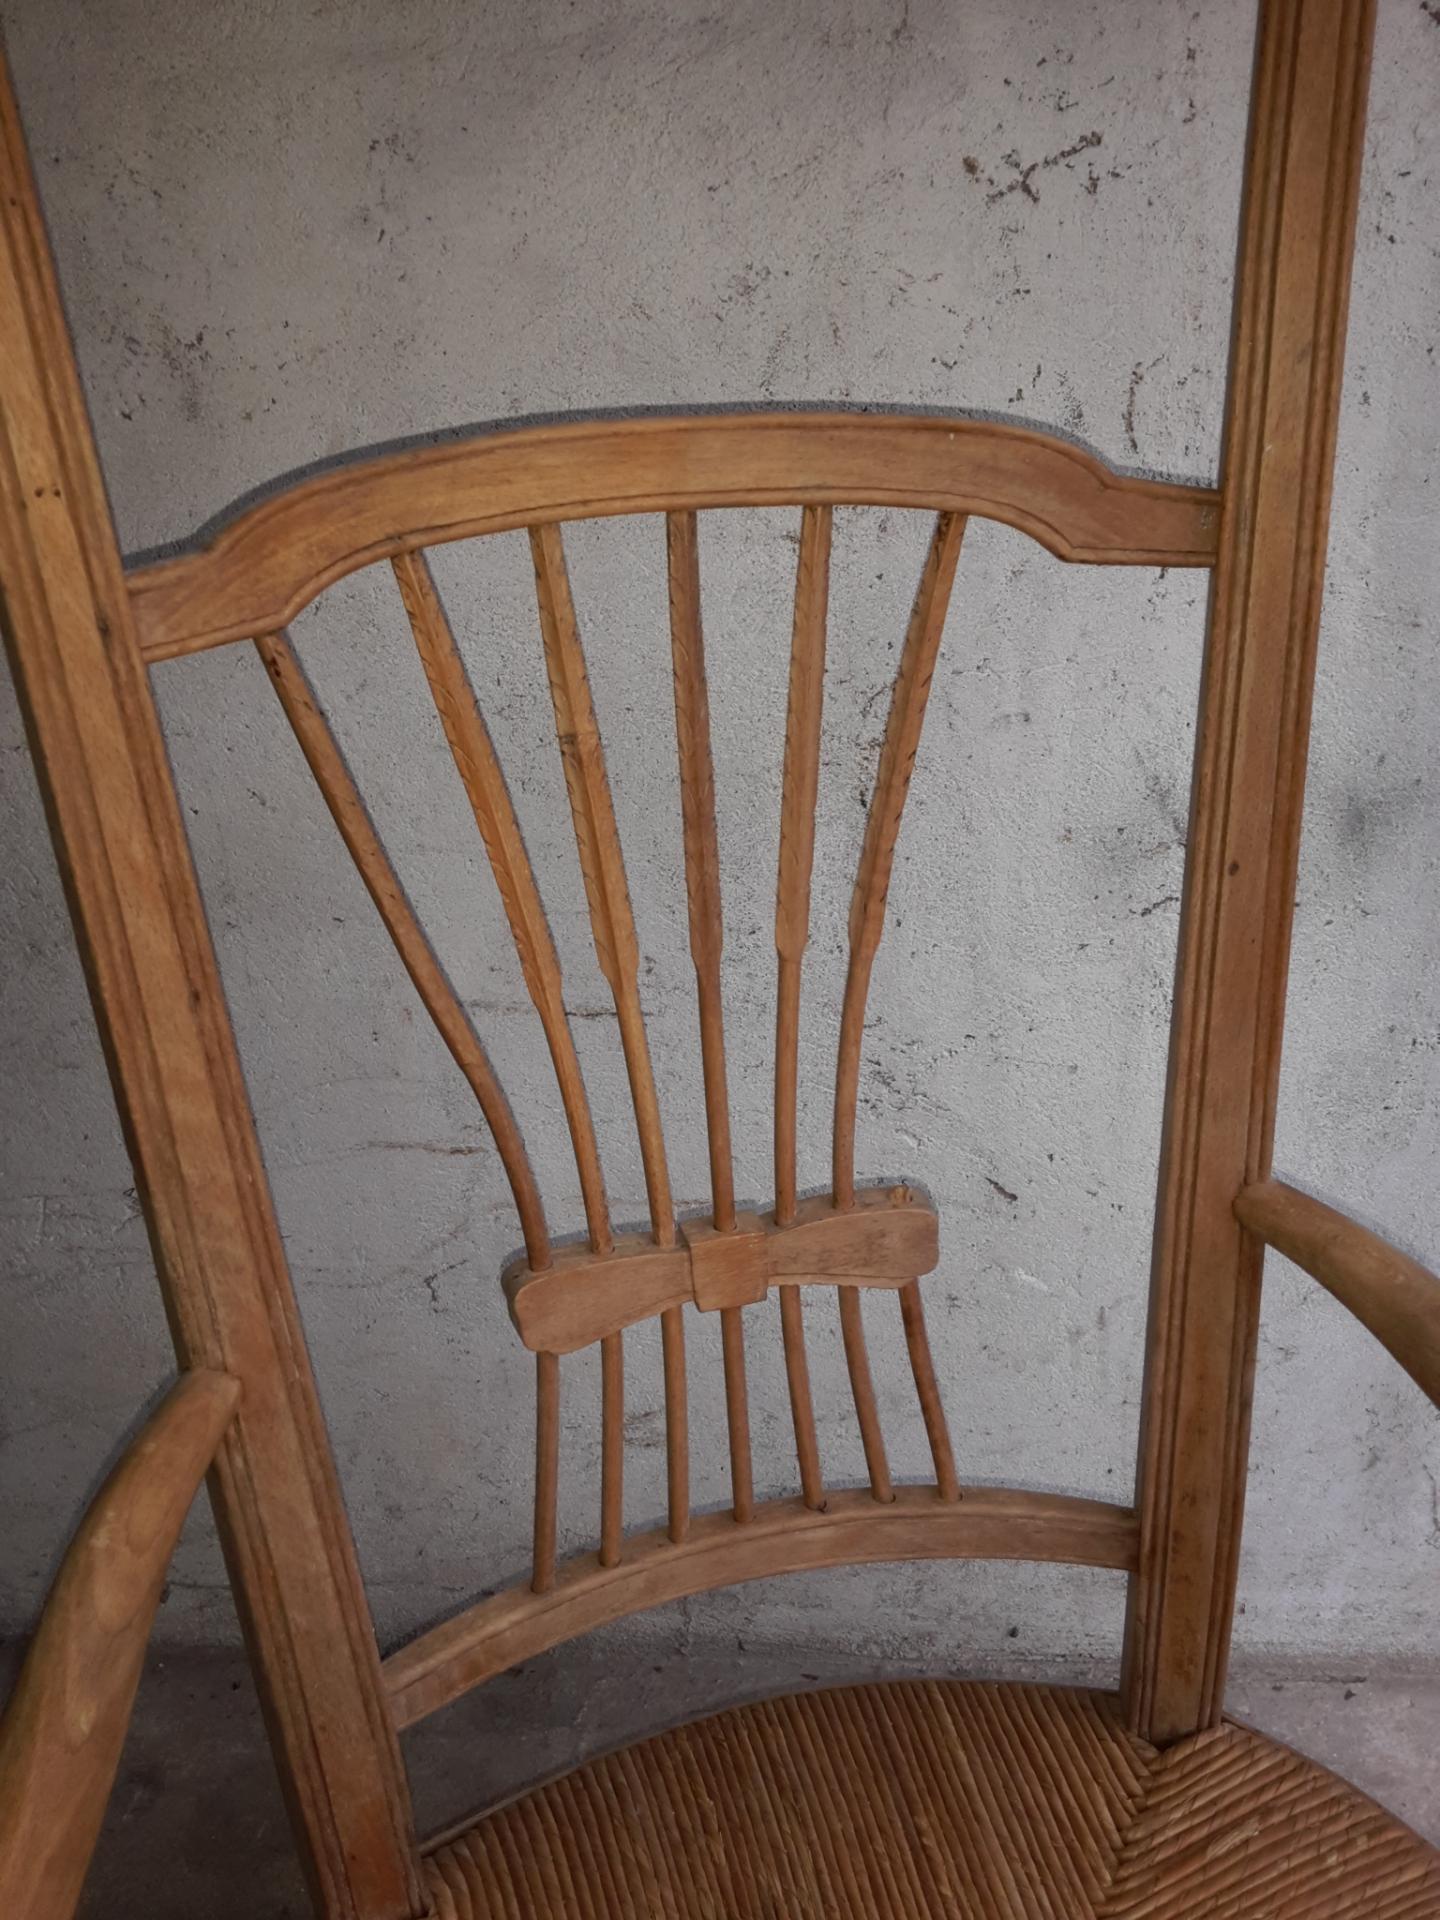 5 chaise de nourrice bis